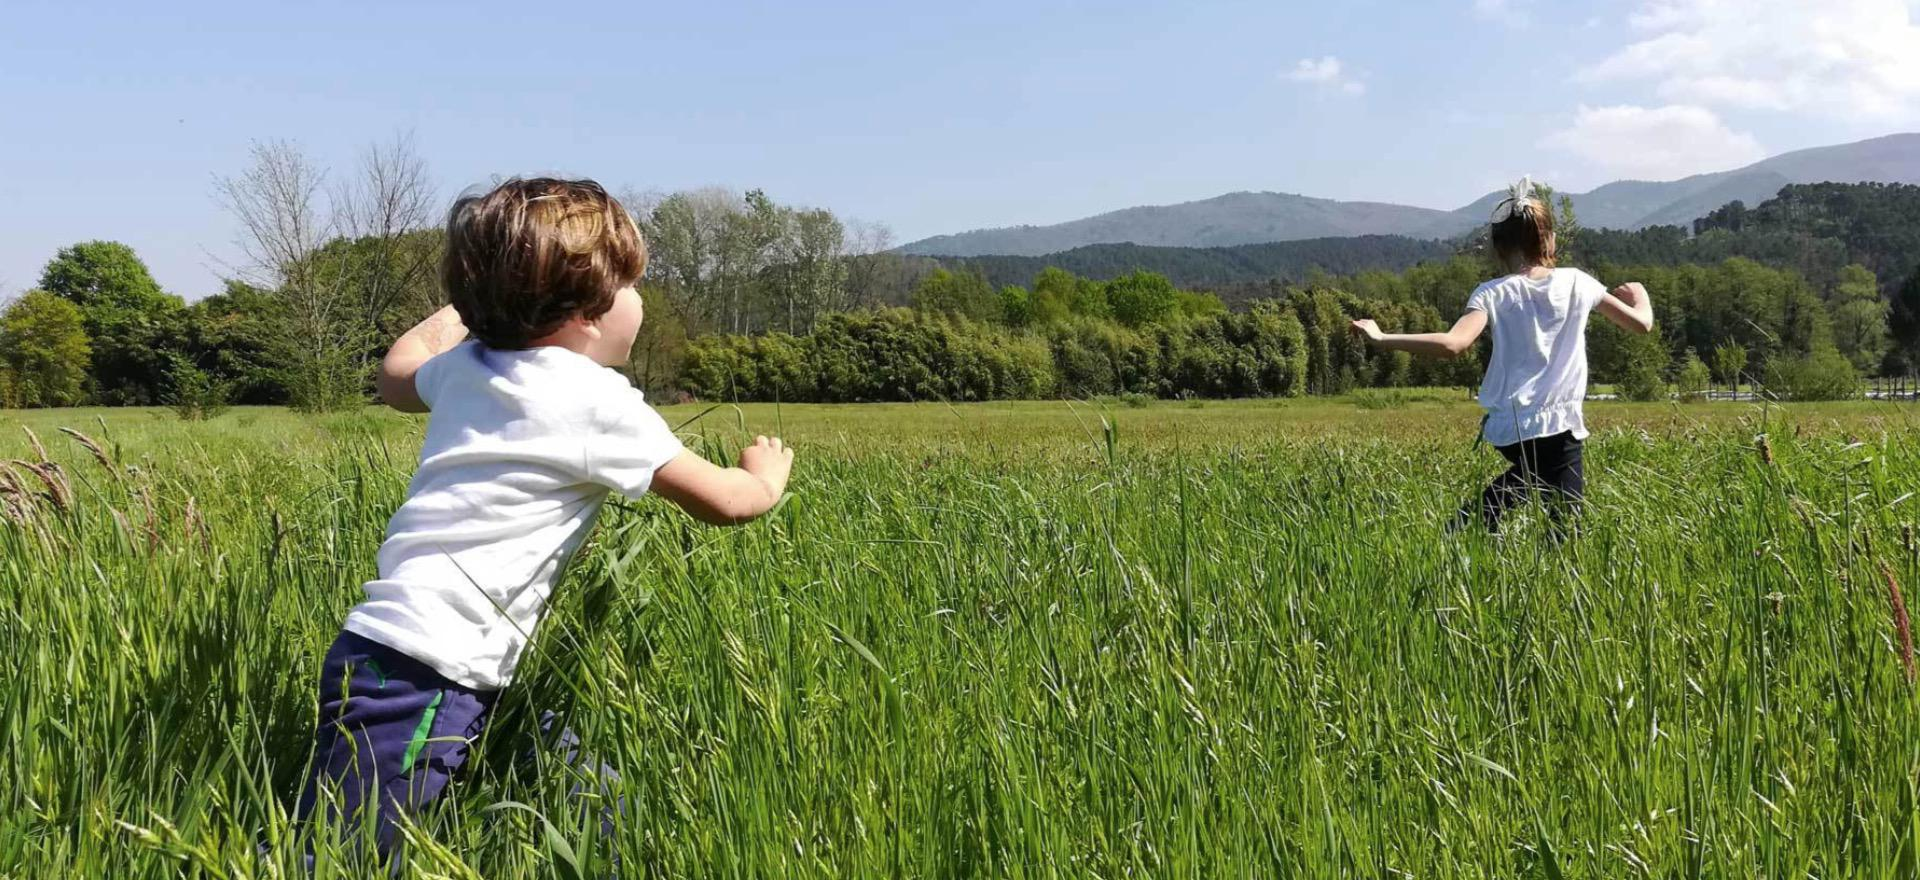 Agriturismo Toscana Agriturismo accogliente vicino a Lucca